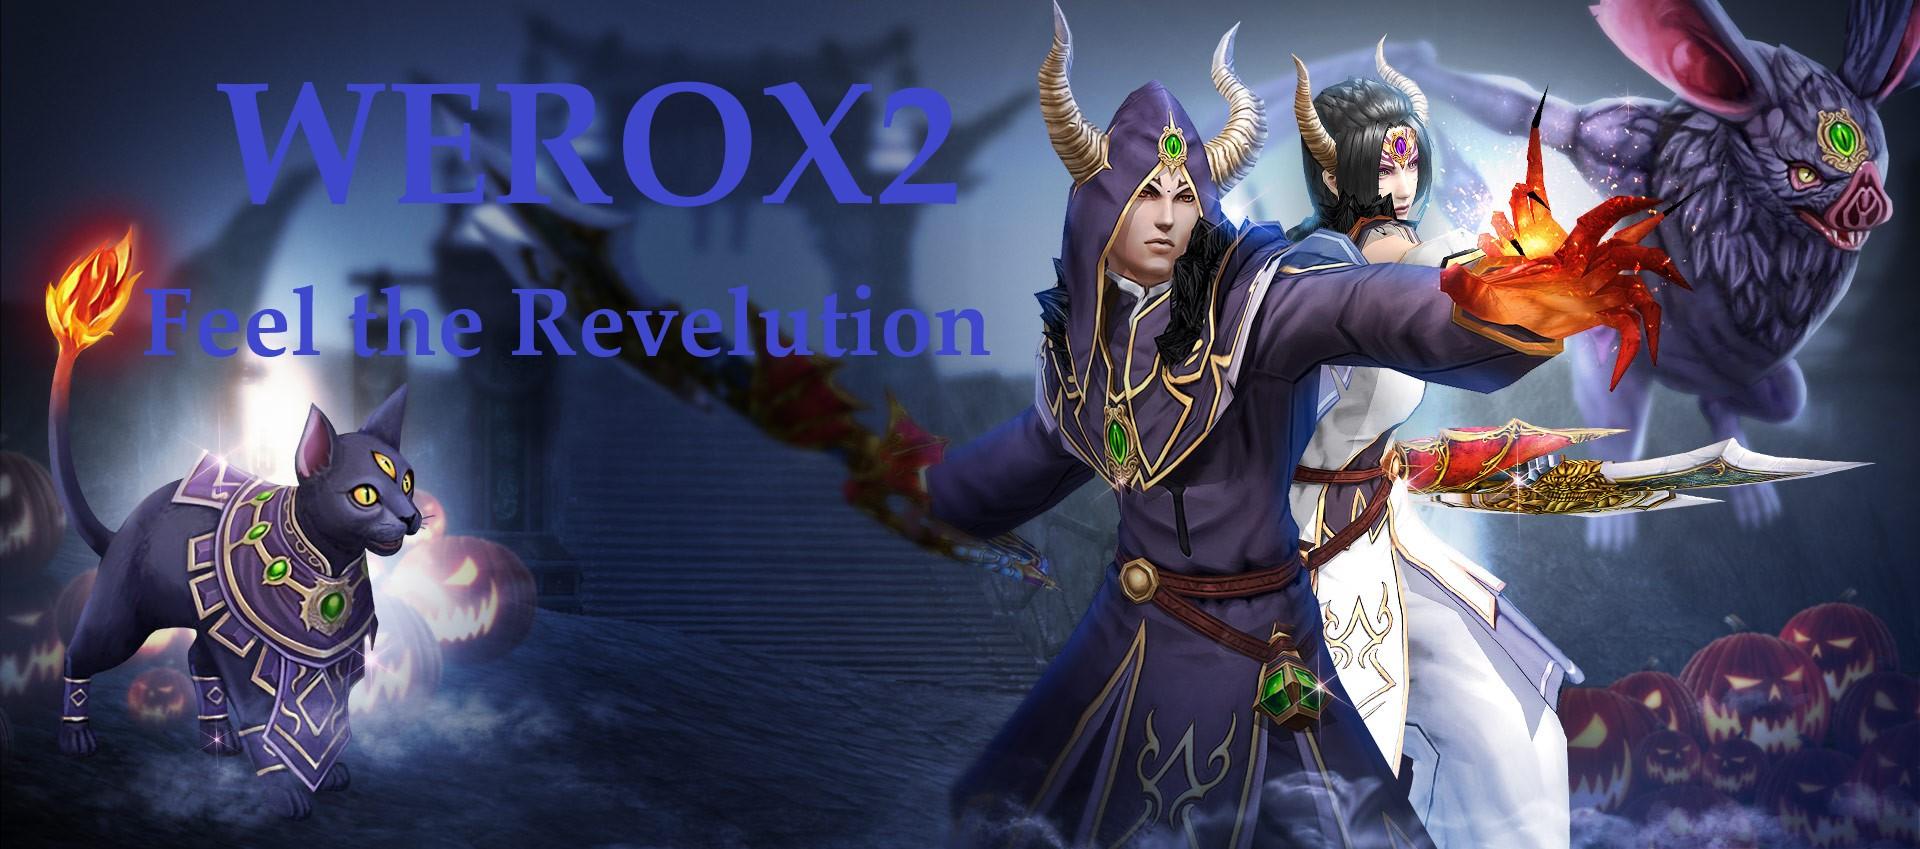 Werox2 [PvP] - Feel the Revelution